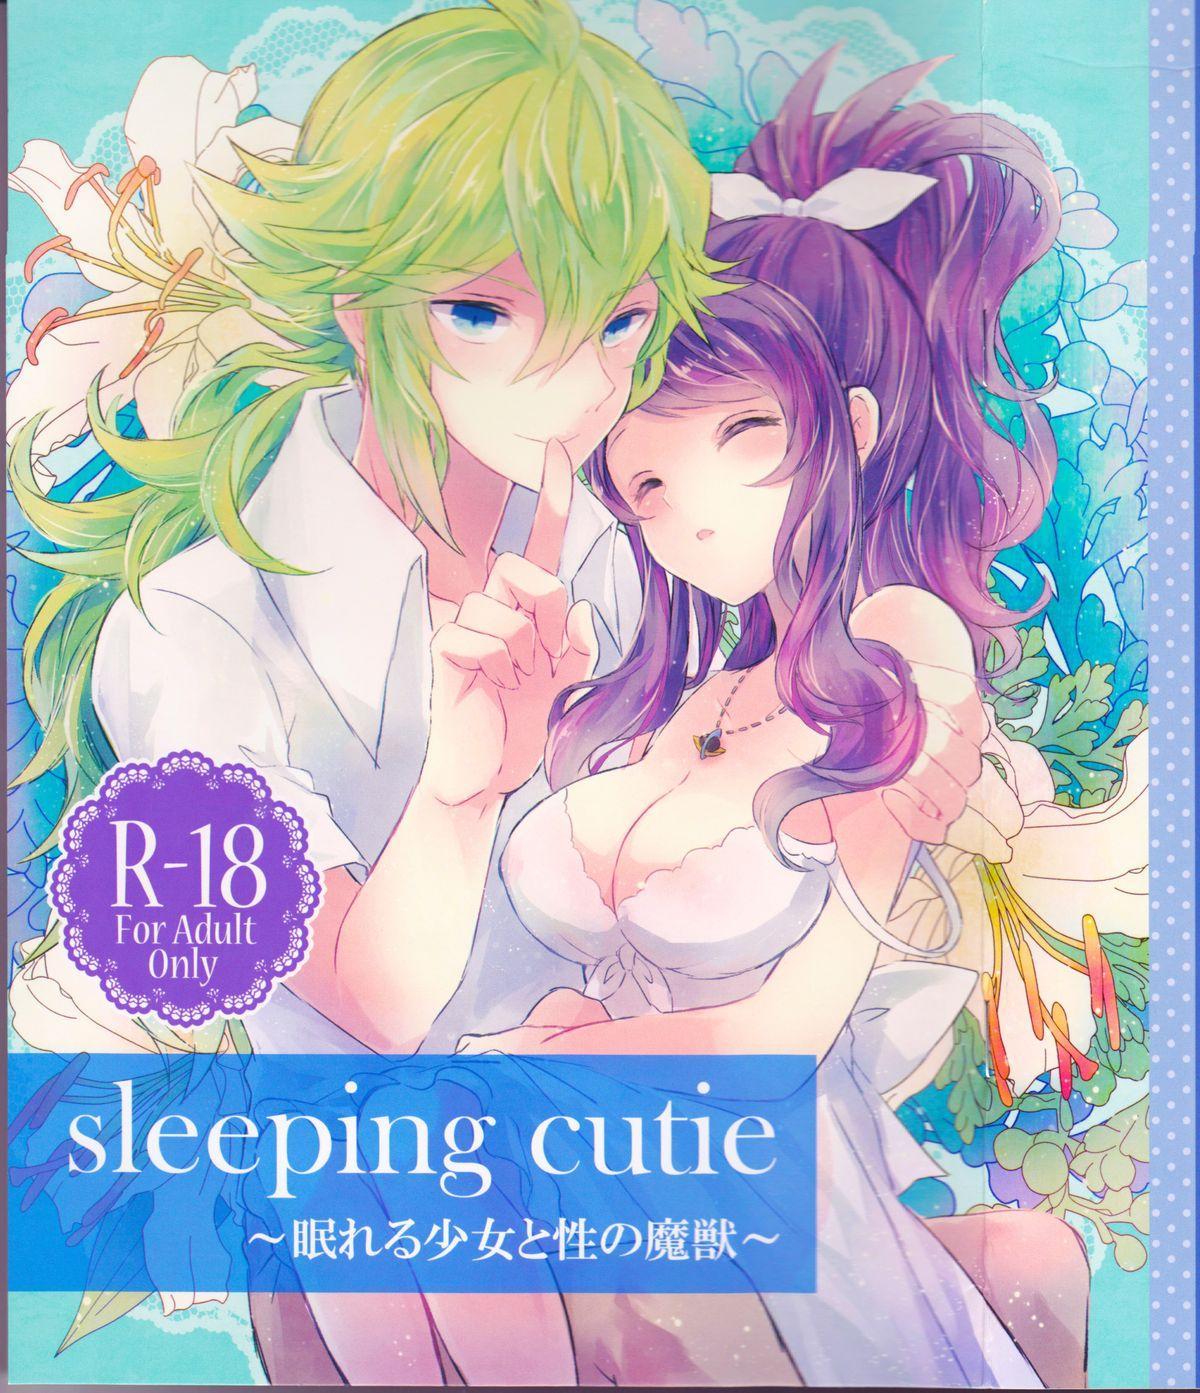 sleeping cutie 0